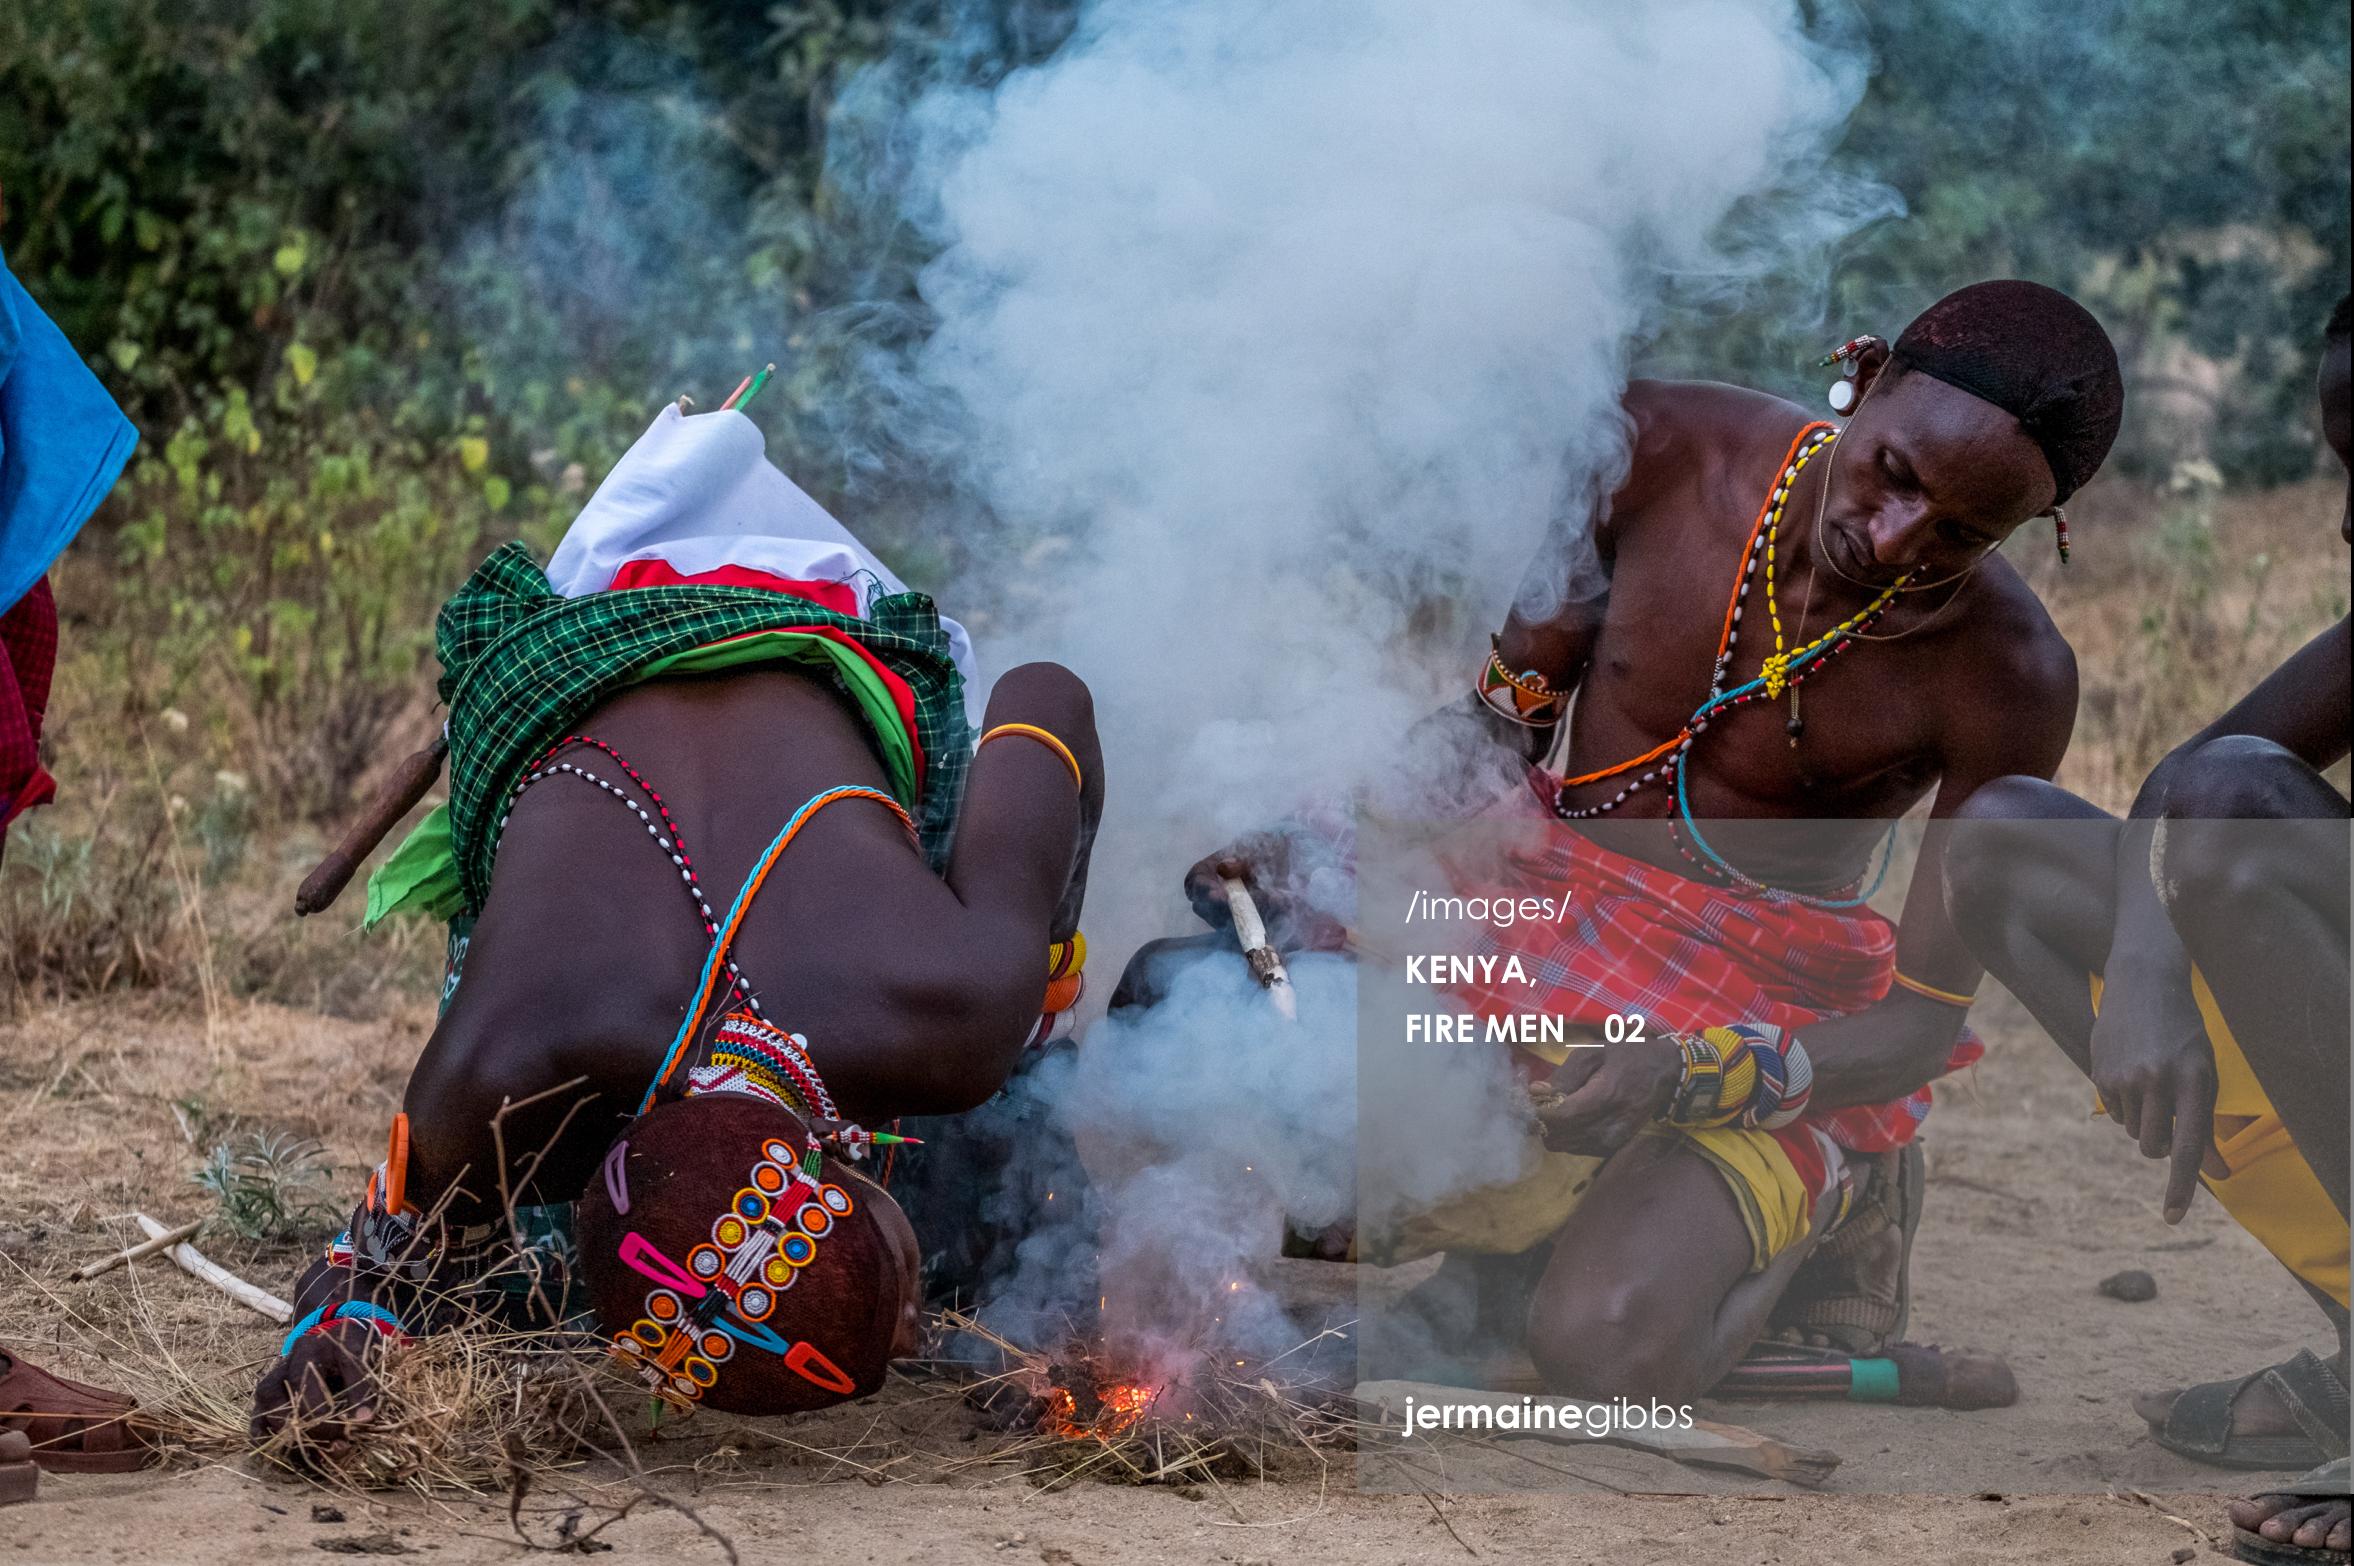 Kenya_Fire Men__02